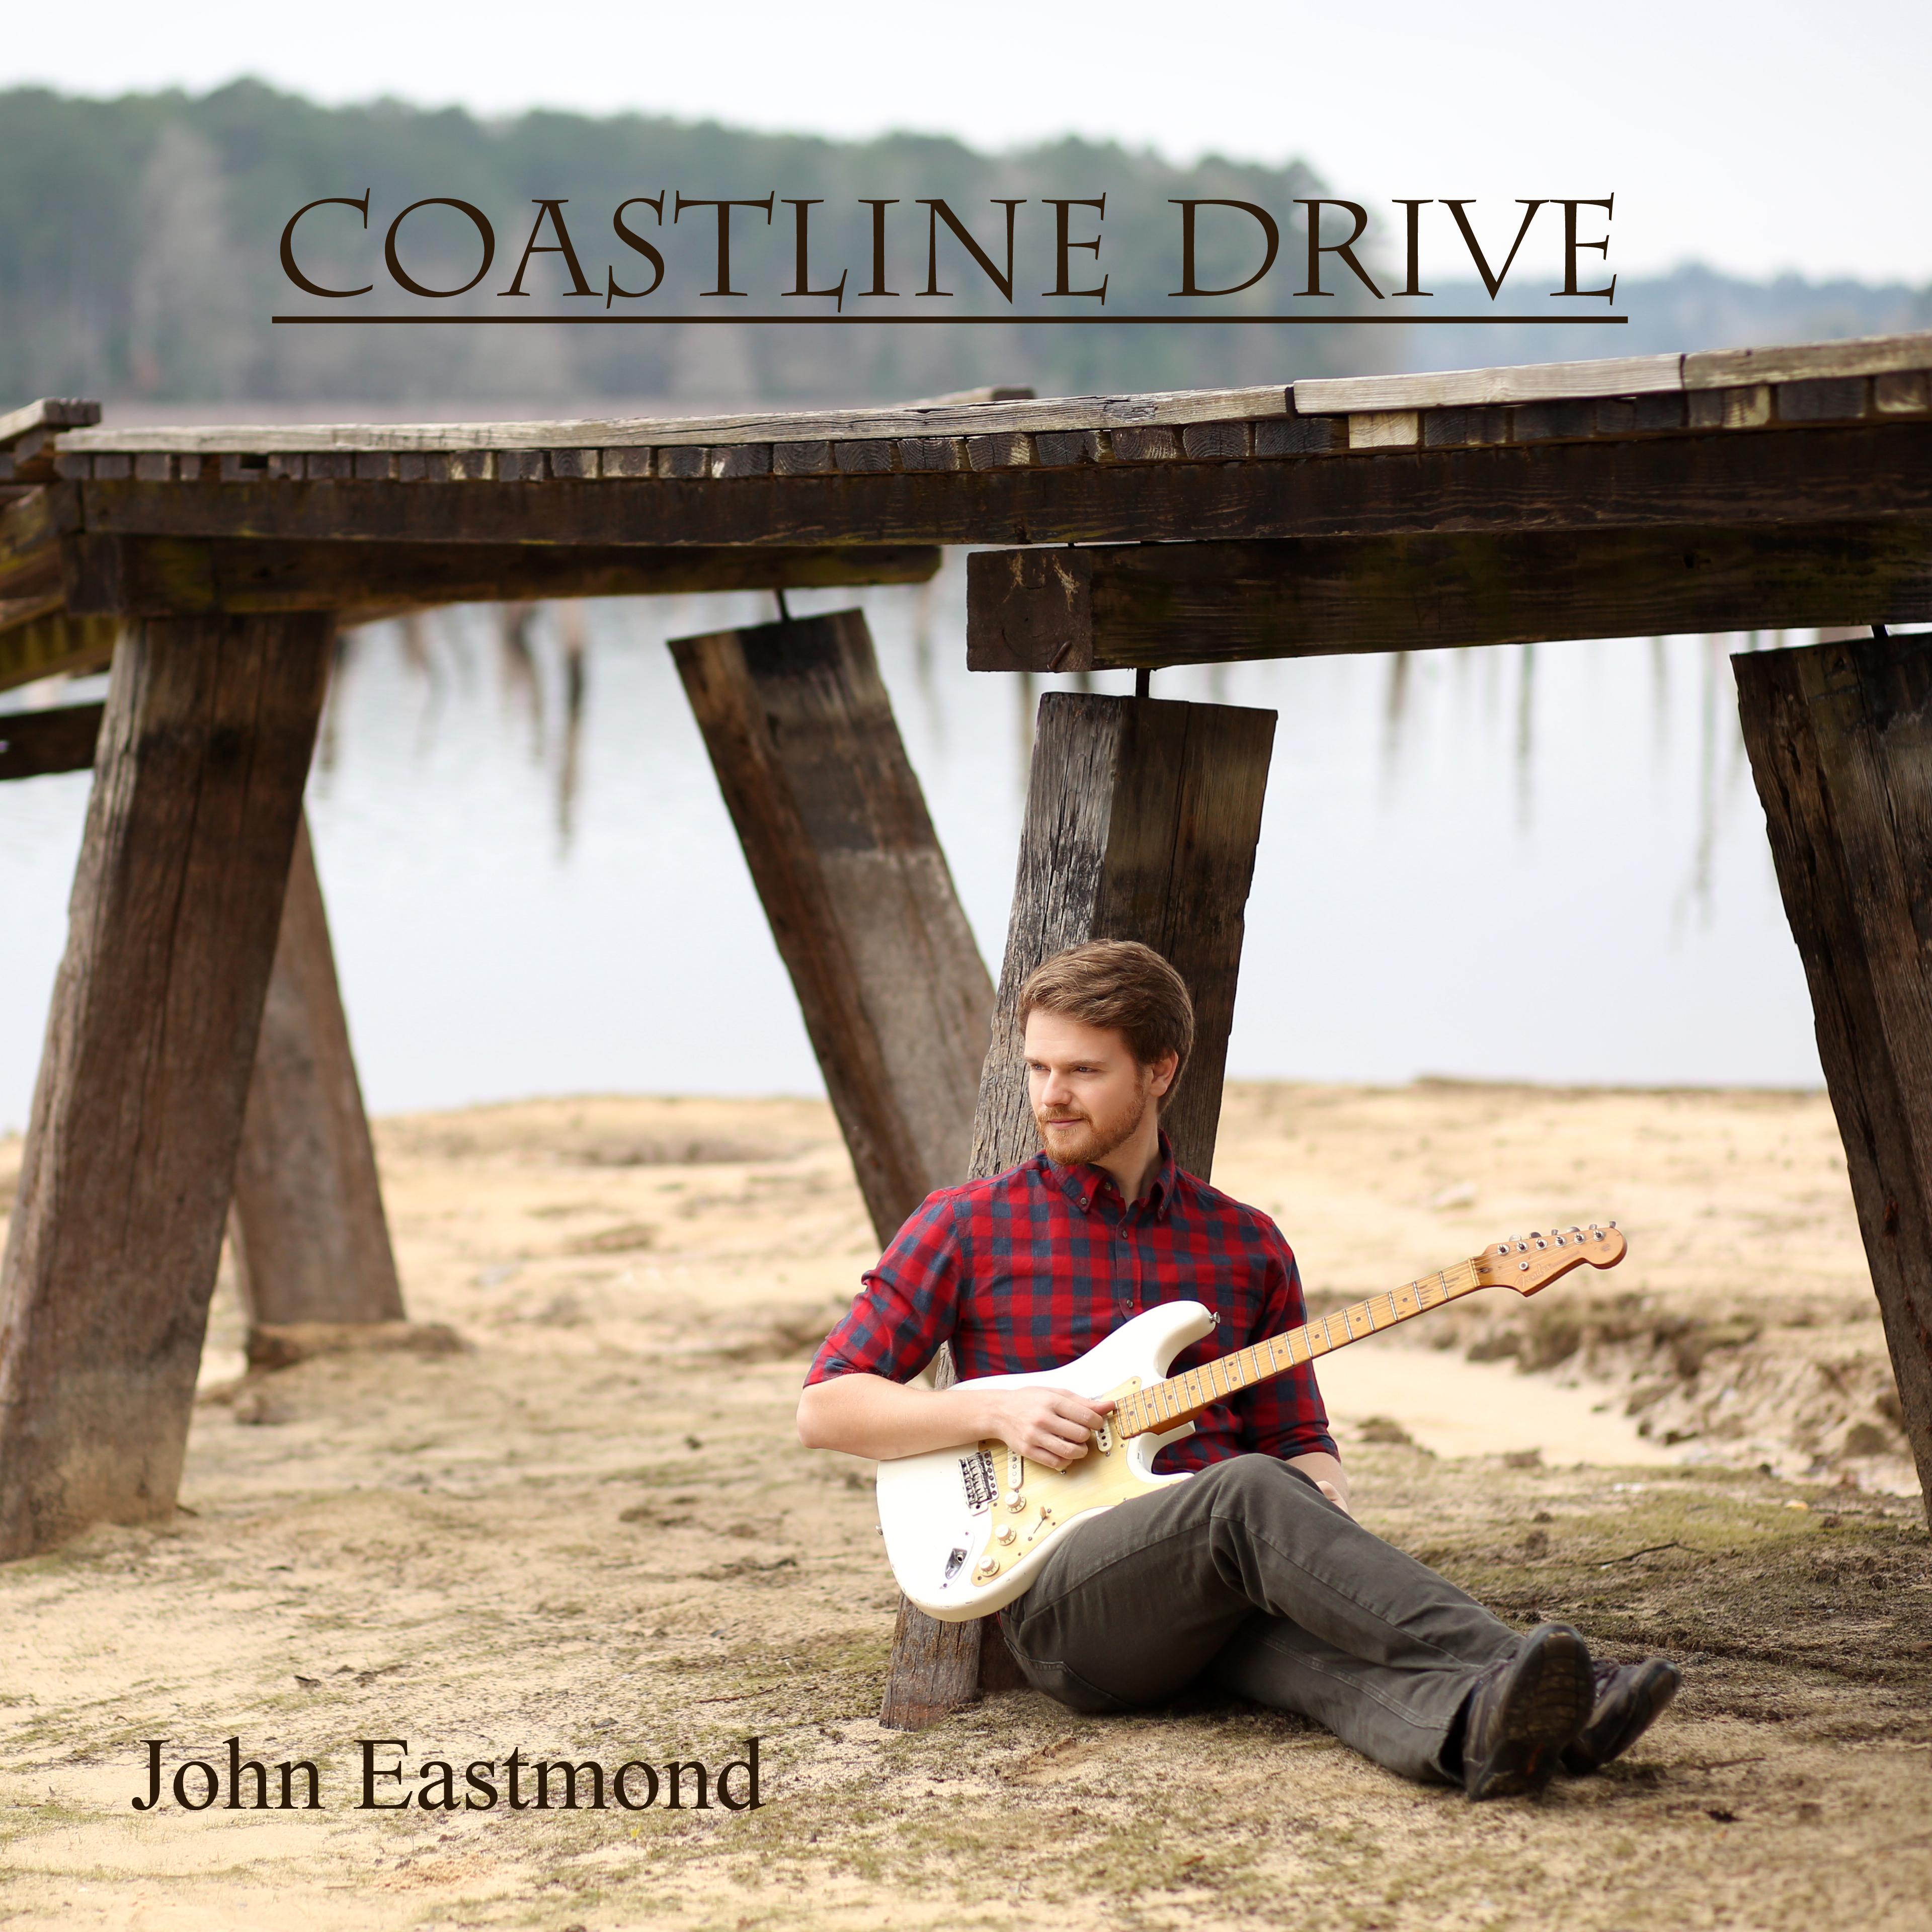 Coastline Drive